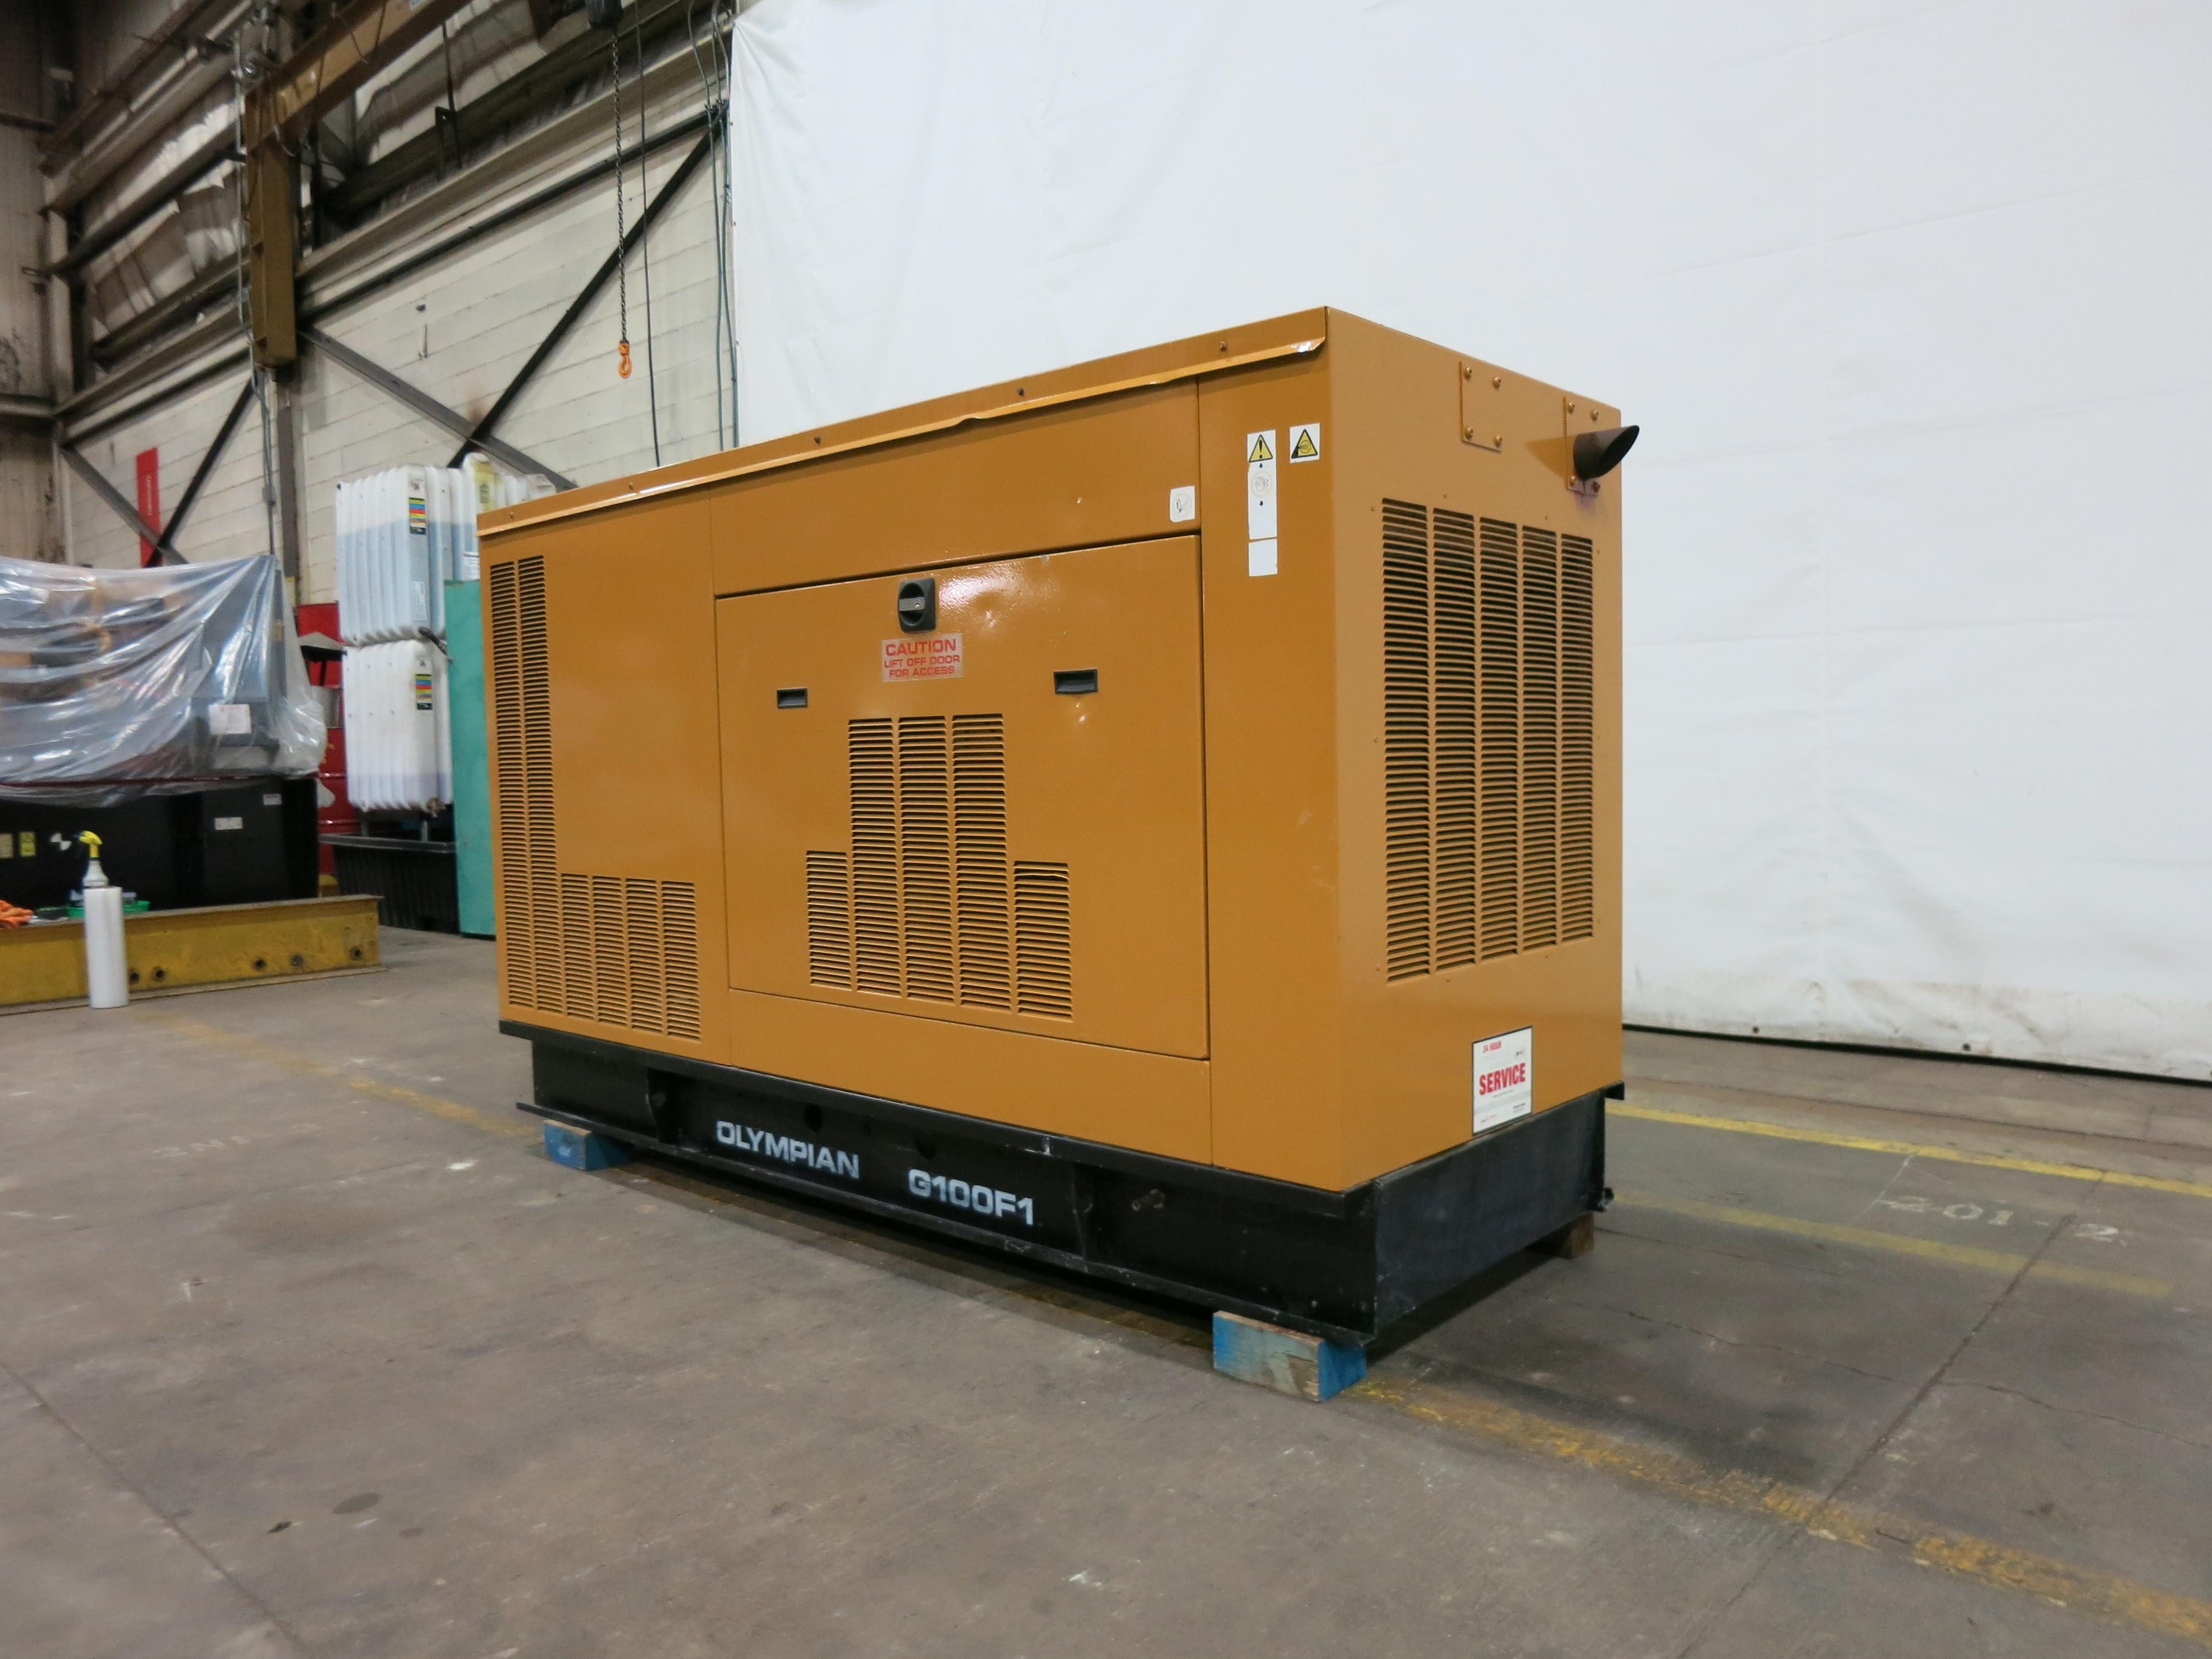 Used Caterpillar / Olympian G100F1 Natural Gas Generator, 227 Hrs